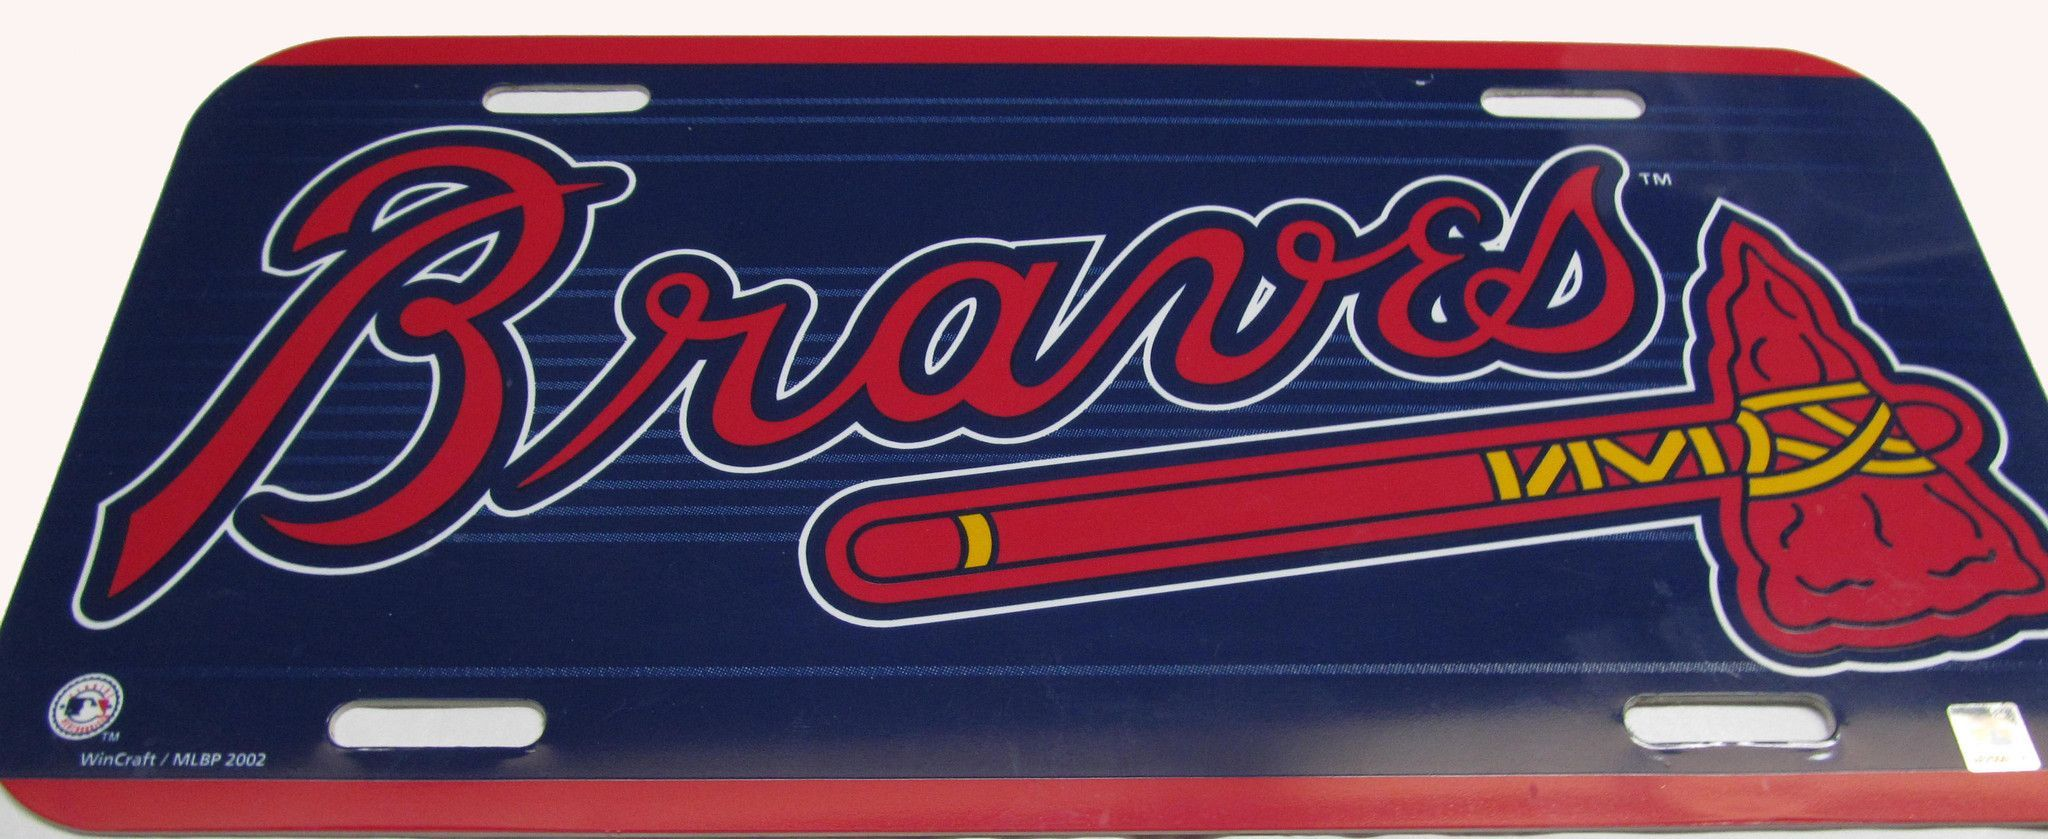 Atlanta Braves License Plate Braves License Plate Atlanta Braves Braves